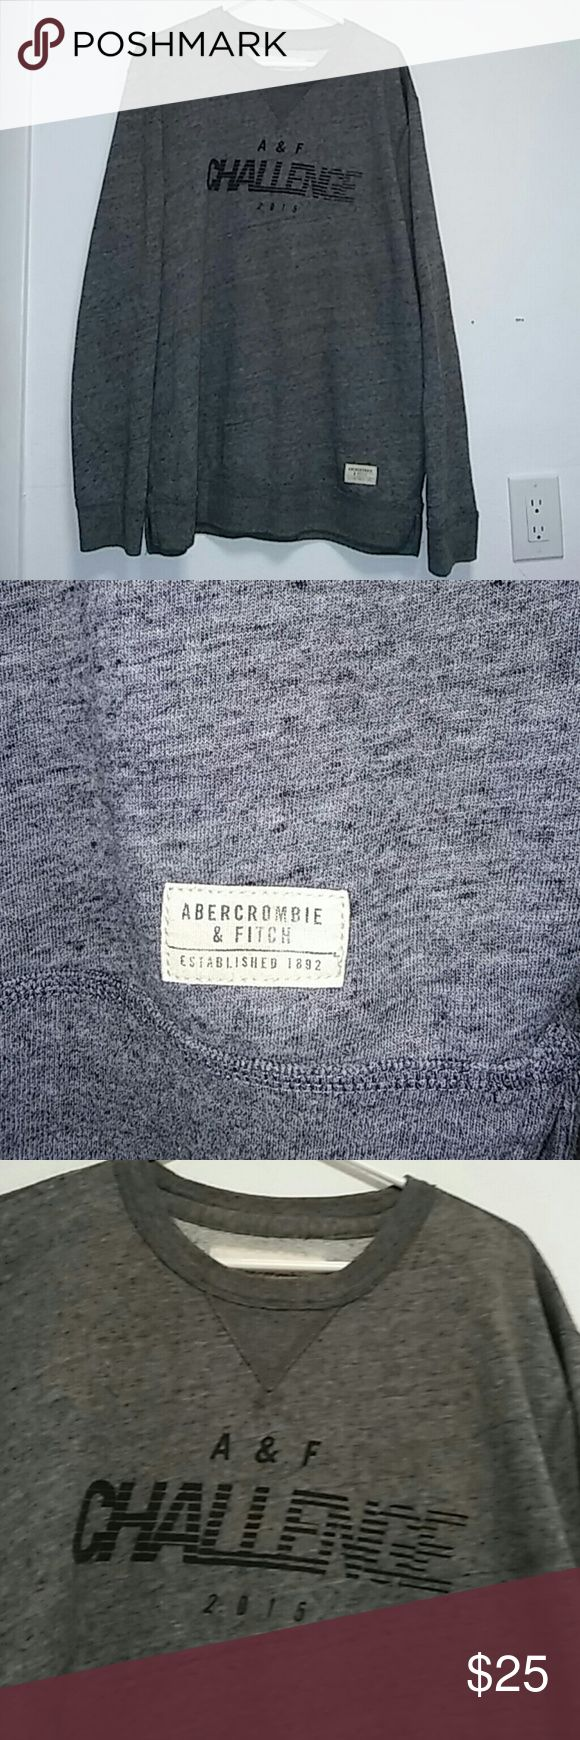 Abercrombie Men's Crewneck Sweater Sz XXL Abercrombie Men's Crewneck Challenge Sweater Sz XXL. Gray Abercrombie & Fitch Sweaters Crewneck